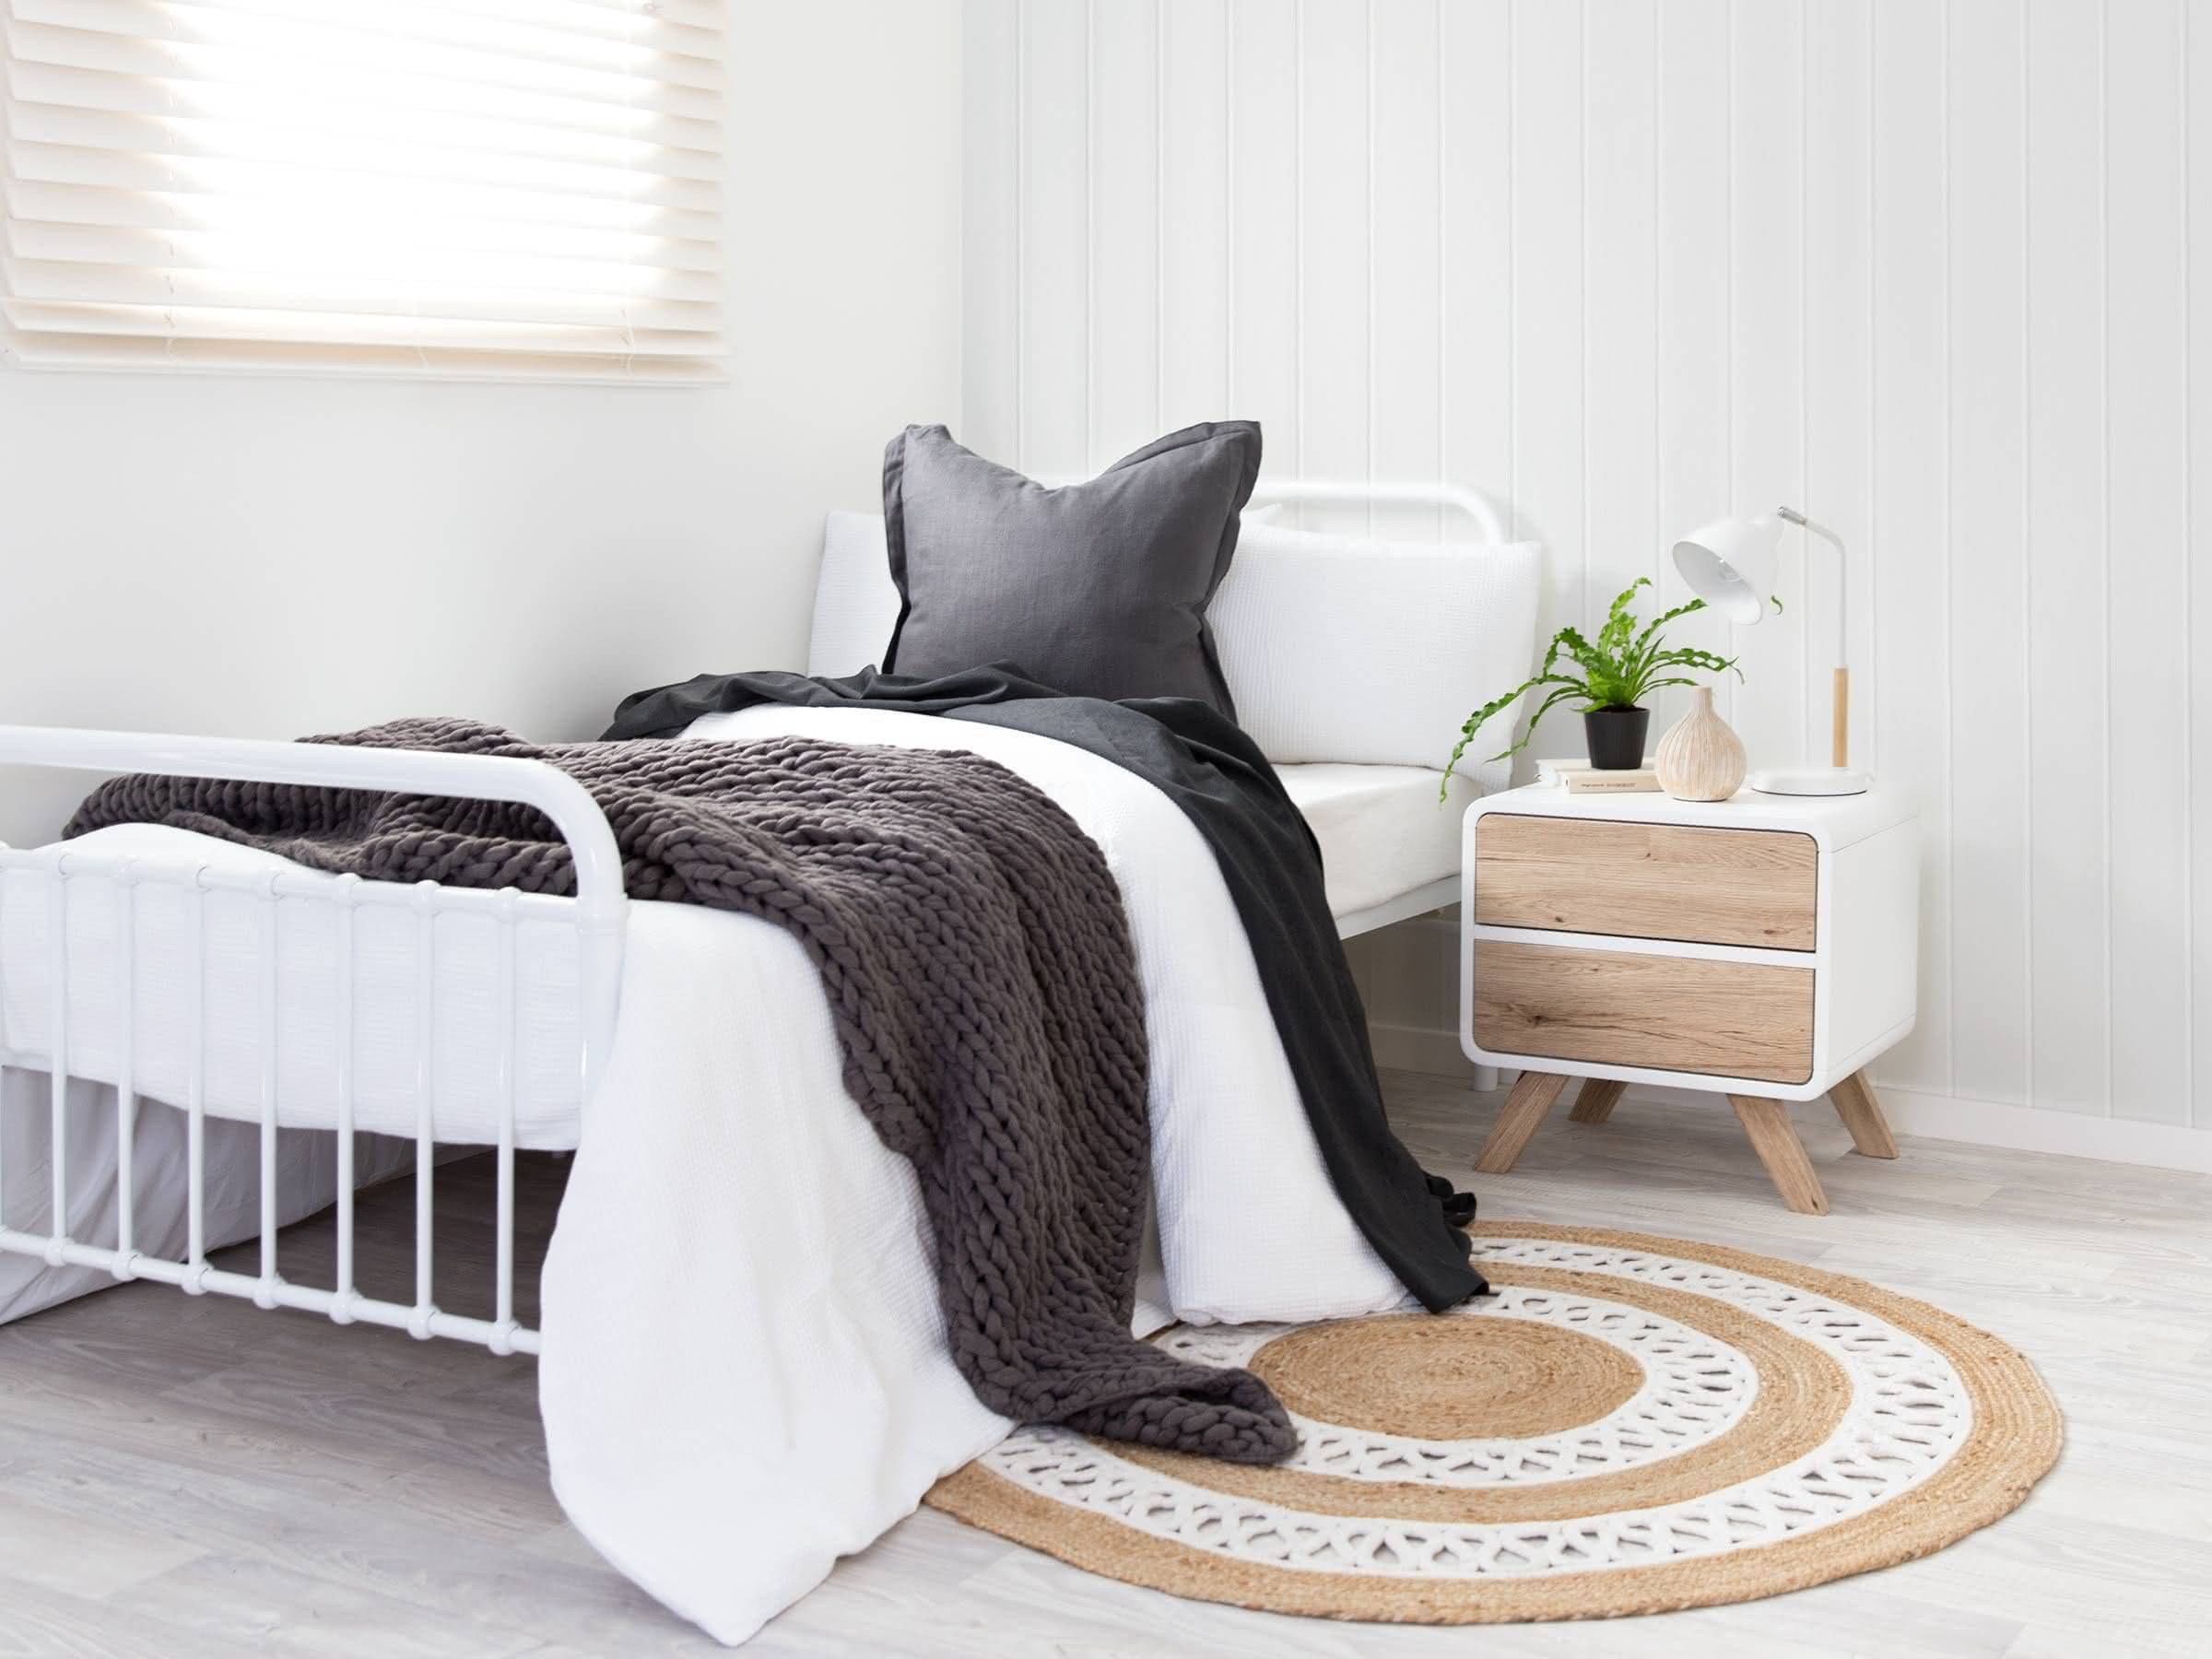 sonata bed 72 x